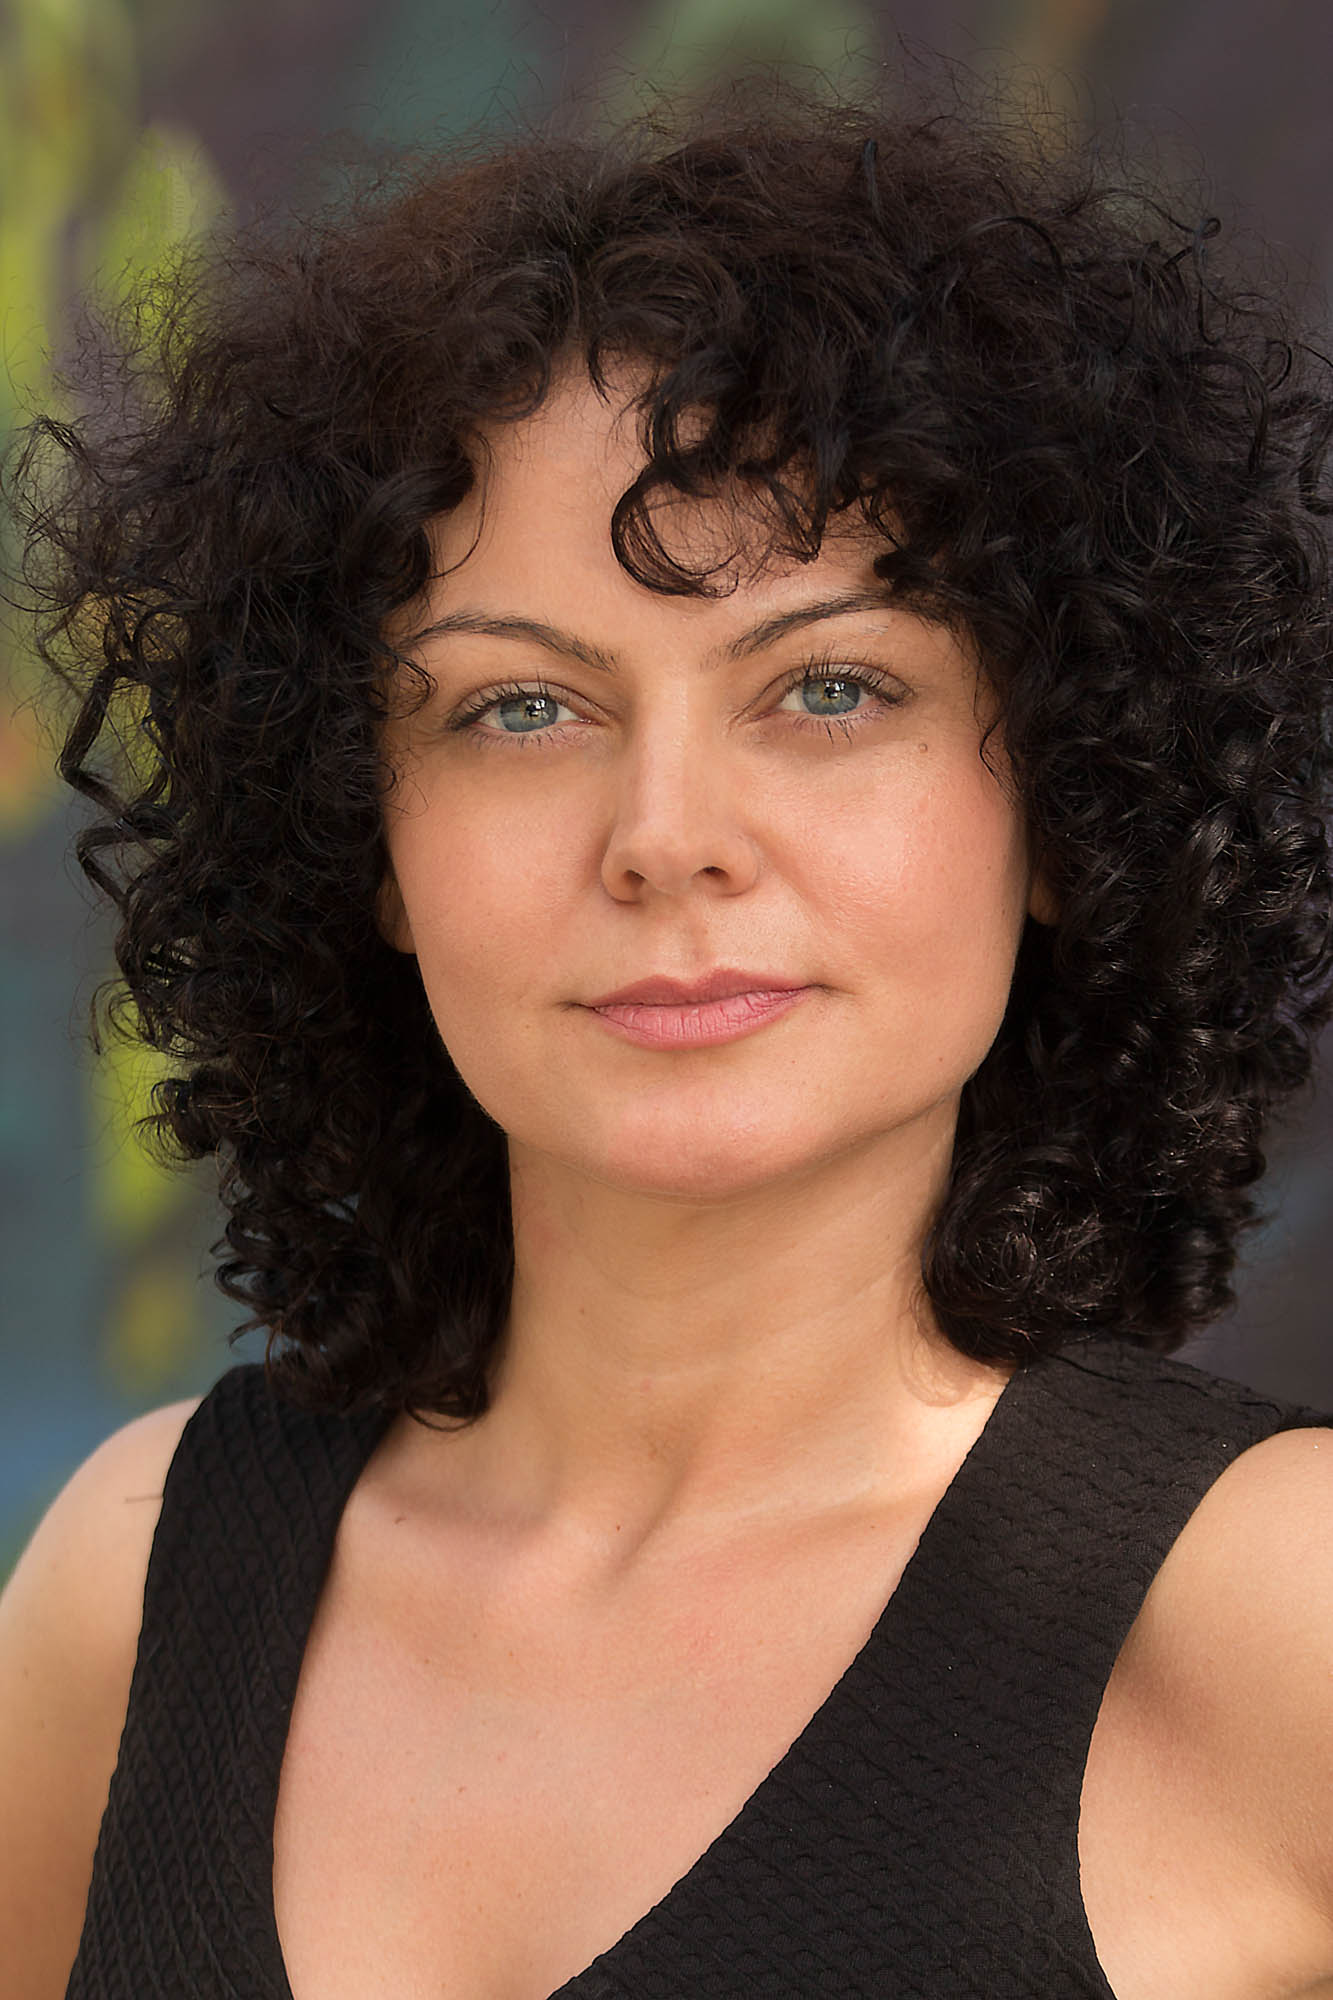 Eva Zylla